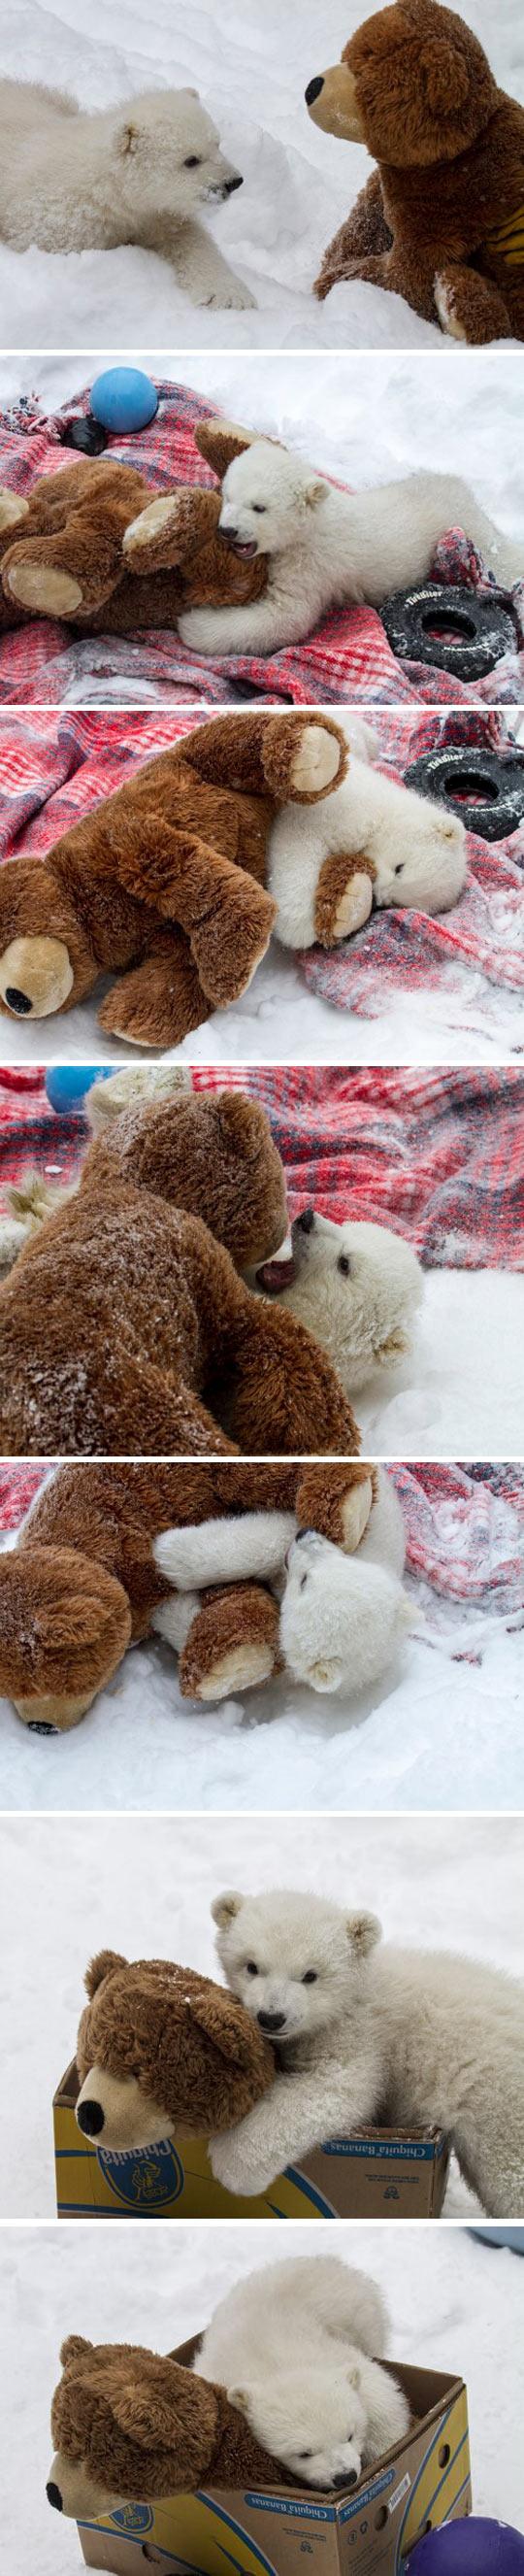 Two teddy bears…